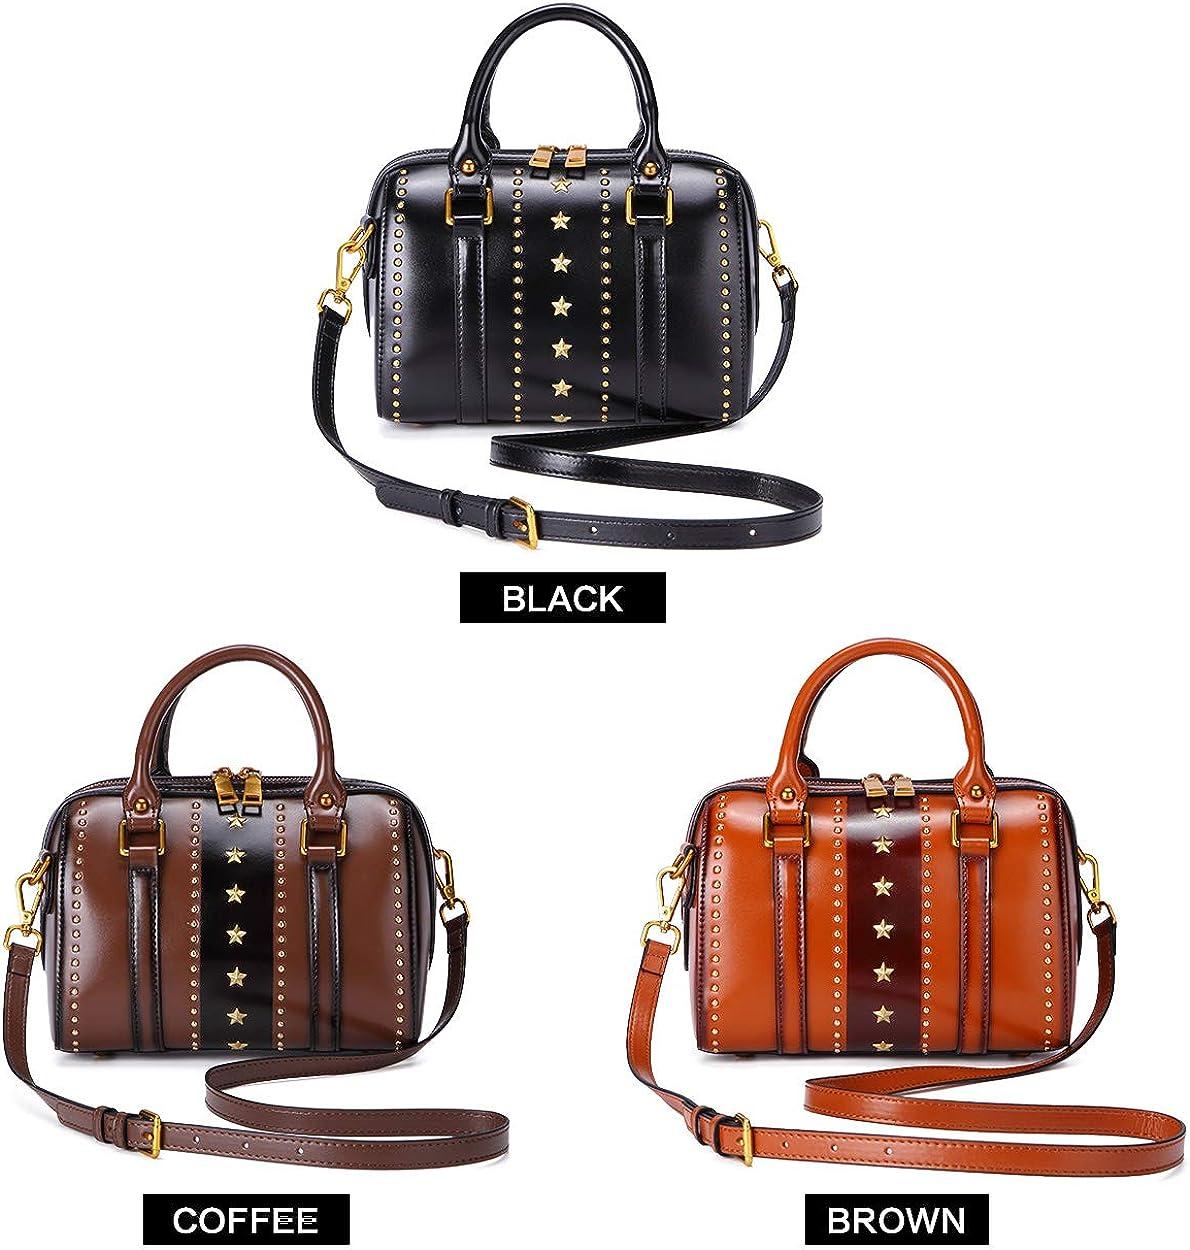 Real Leather Handbag for Women Vintage Top Handle Bag Stylish Rivet Crossbody Bag